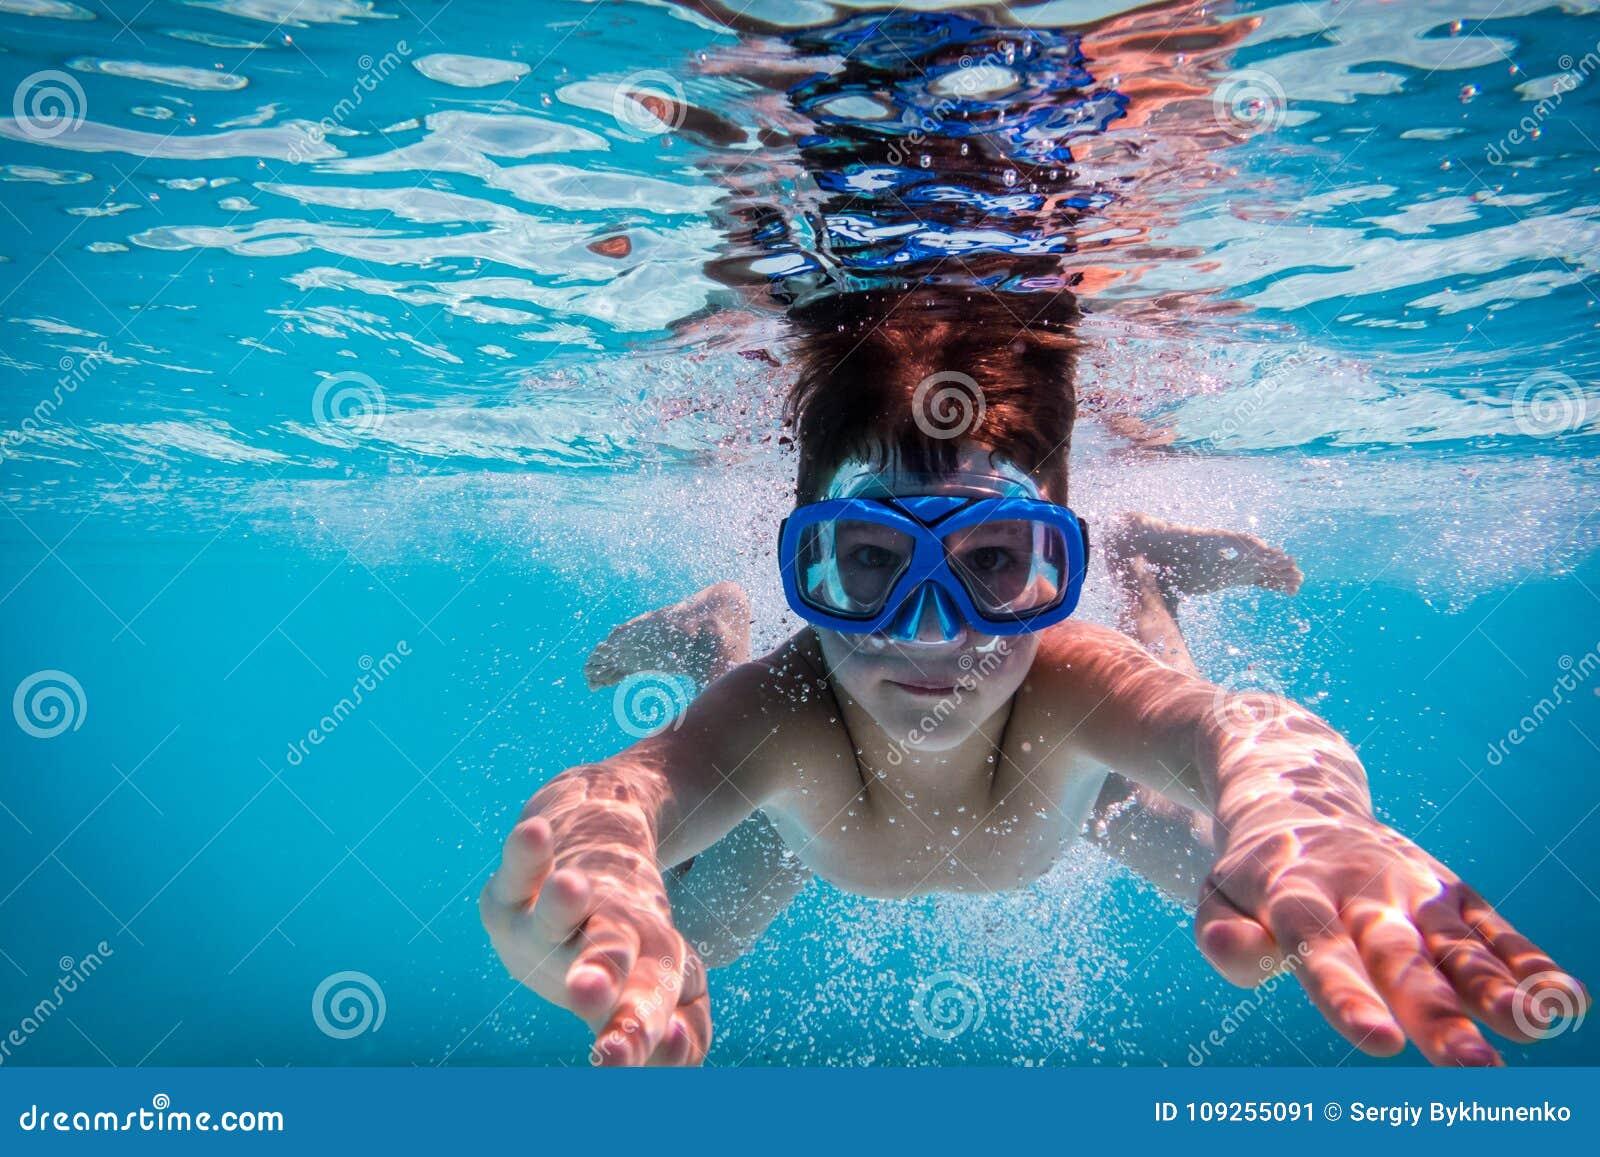 Junge im Maskentauchen im Swimmingpool